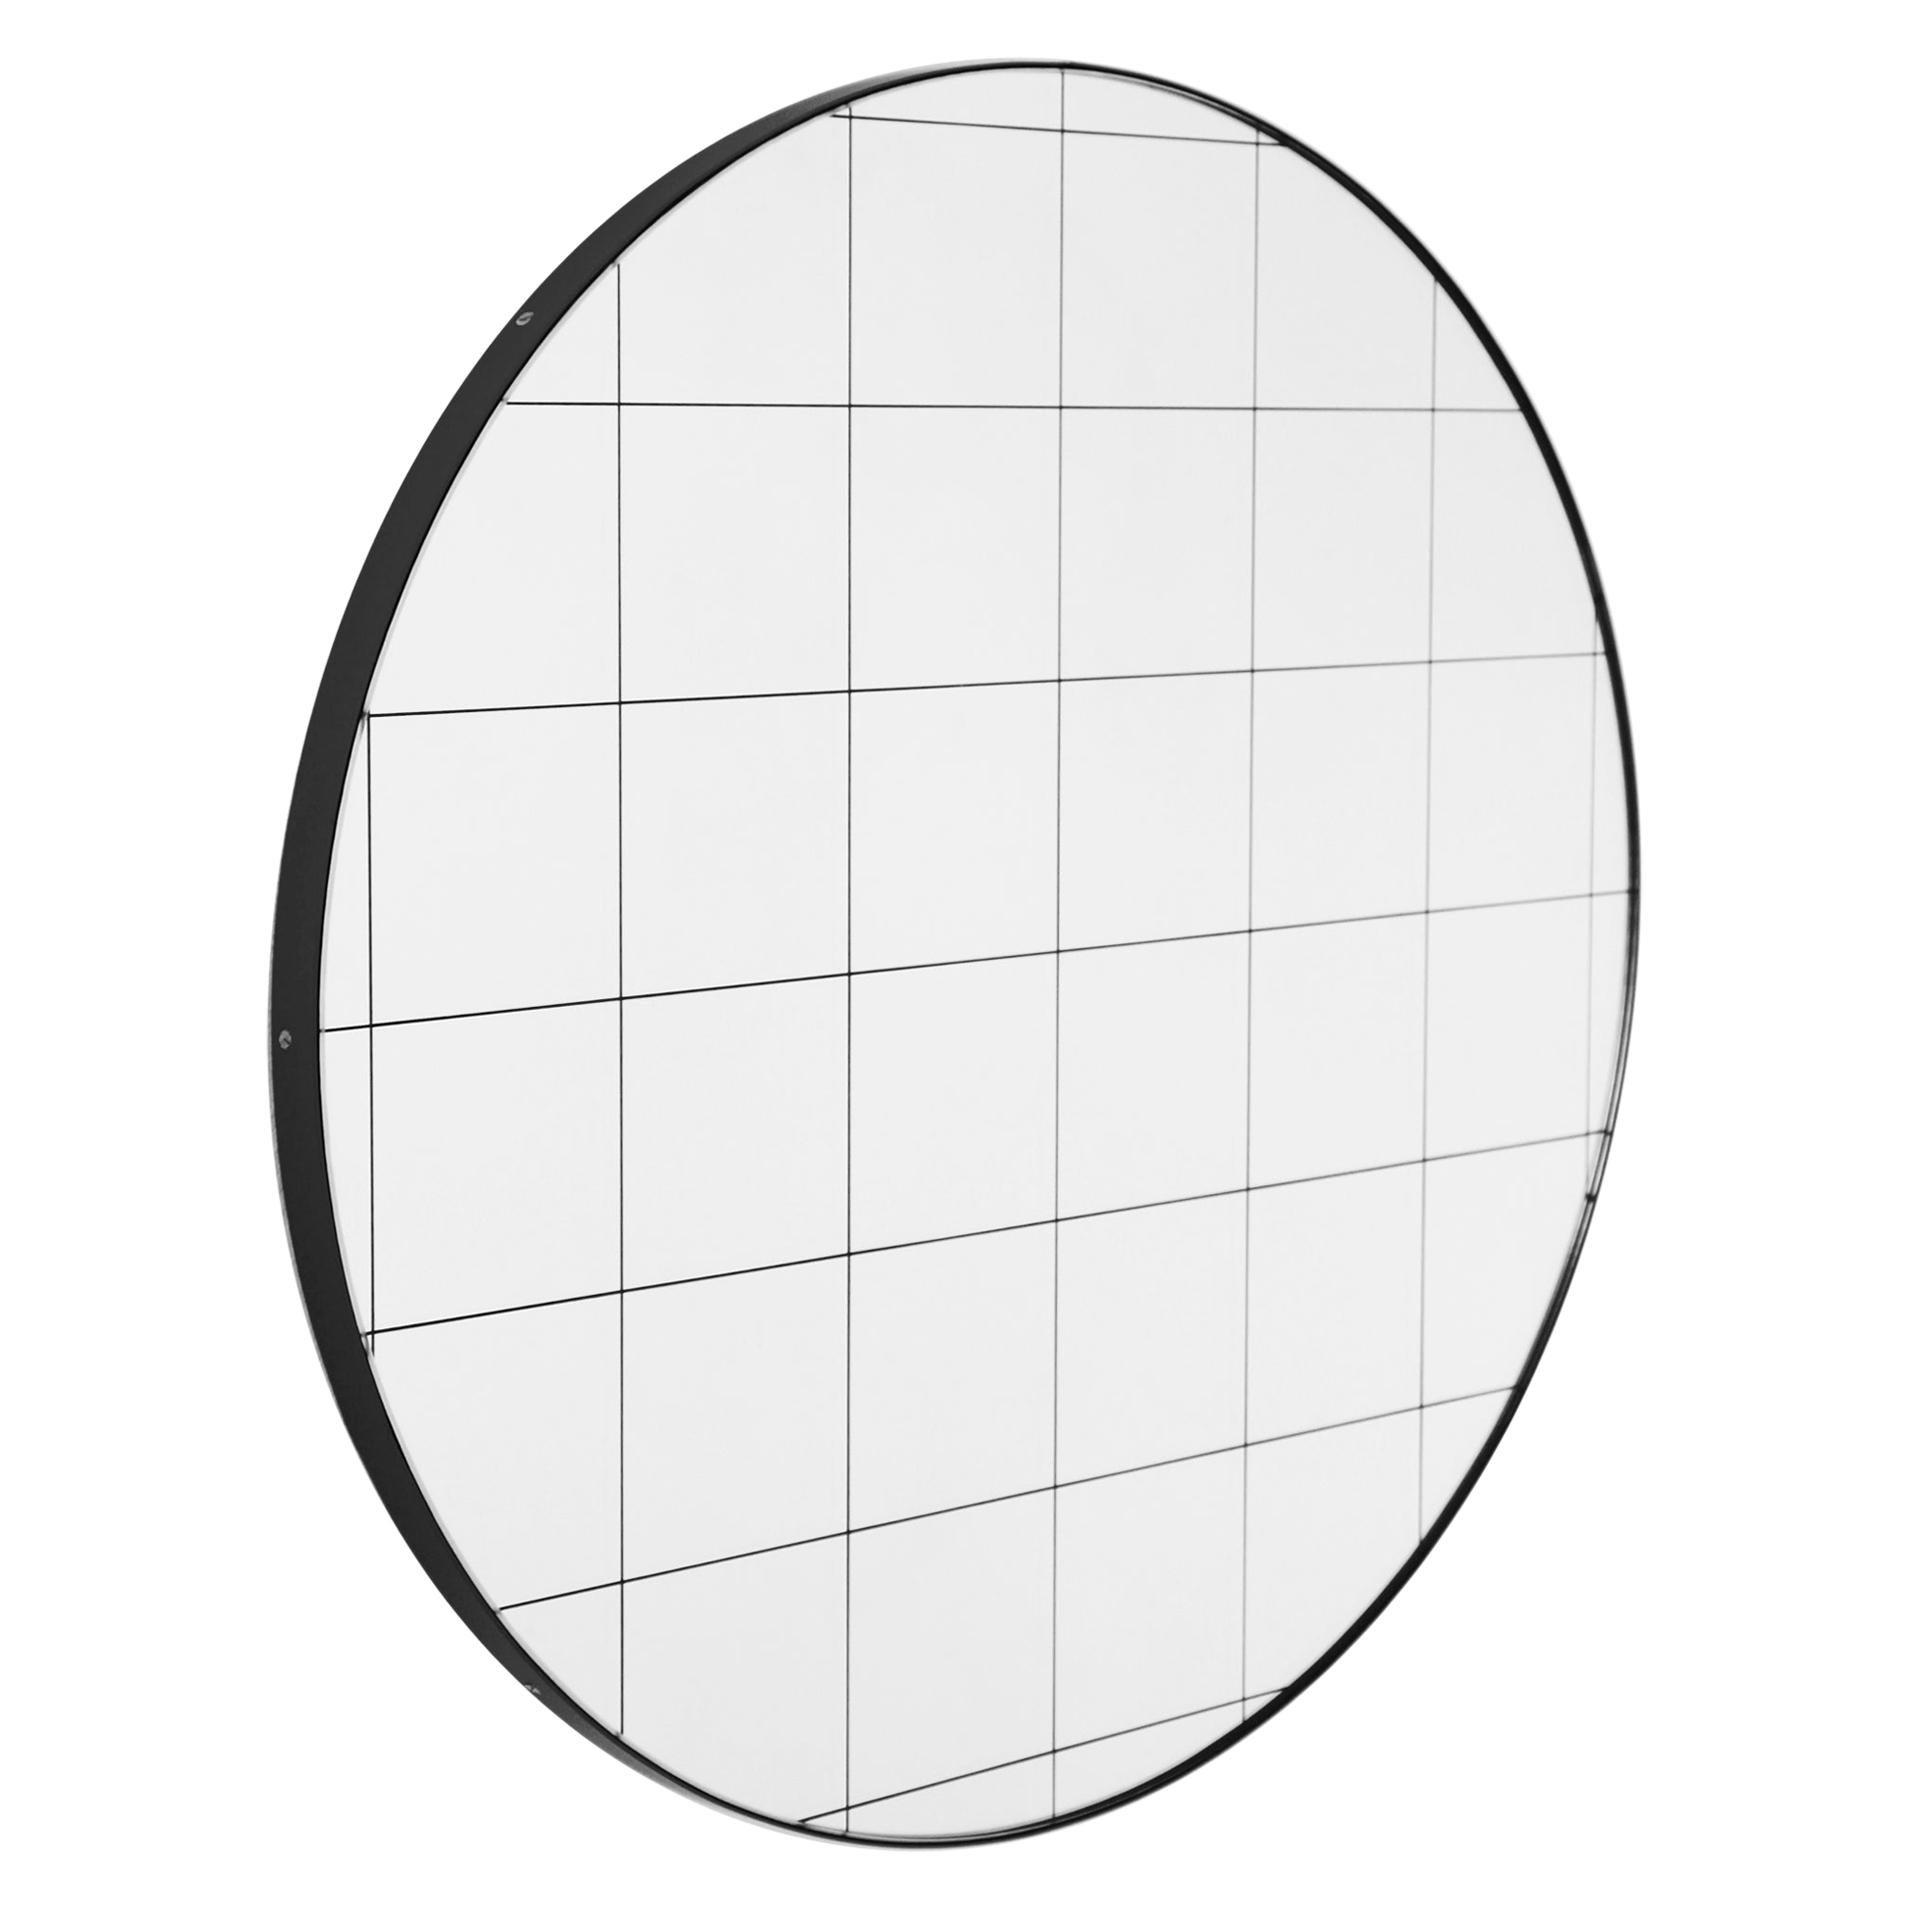 Orbis™ Black Grid Round Minimalist Bespoke Mirror with Black Frame - Large